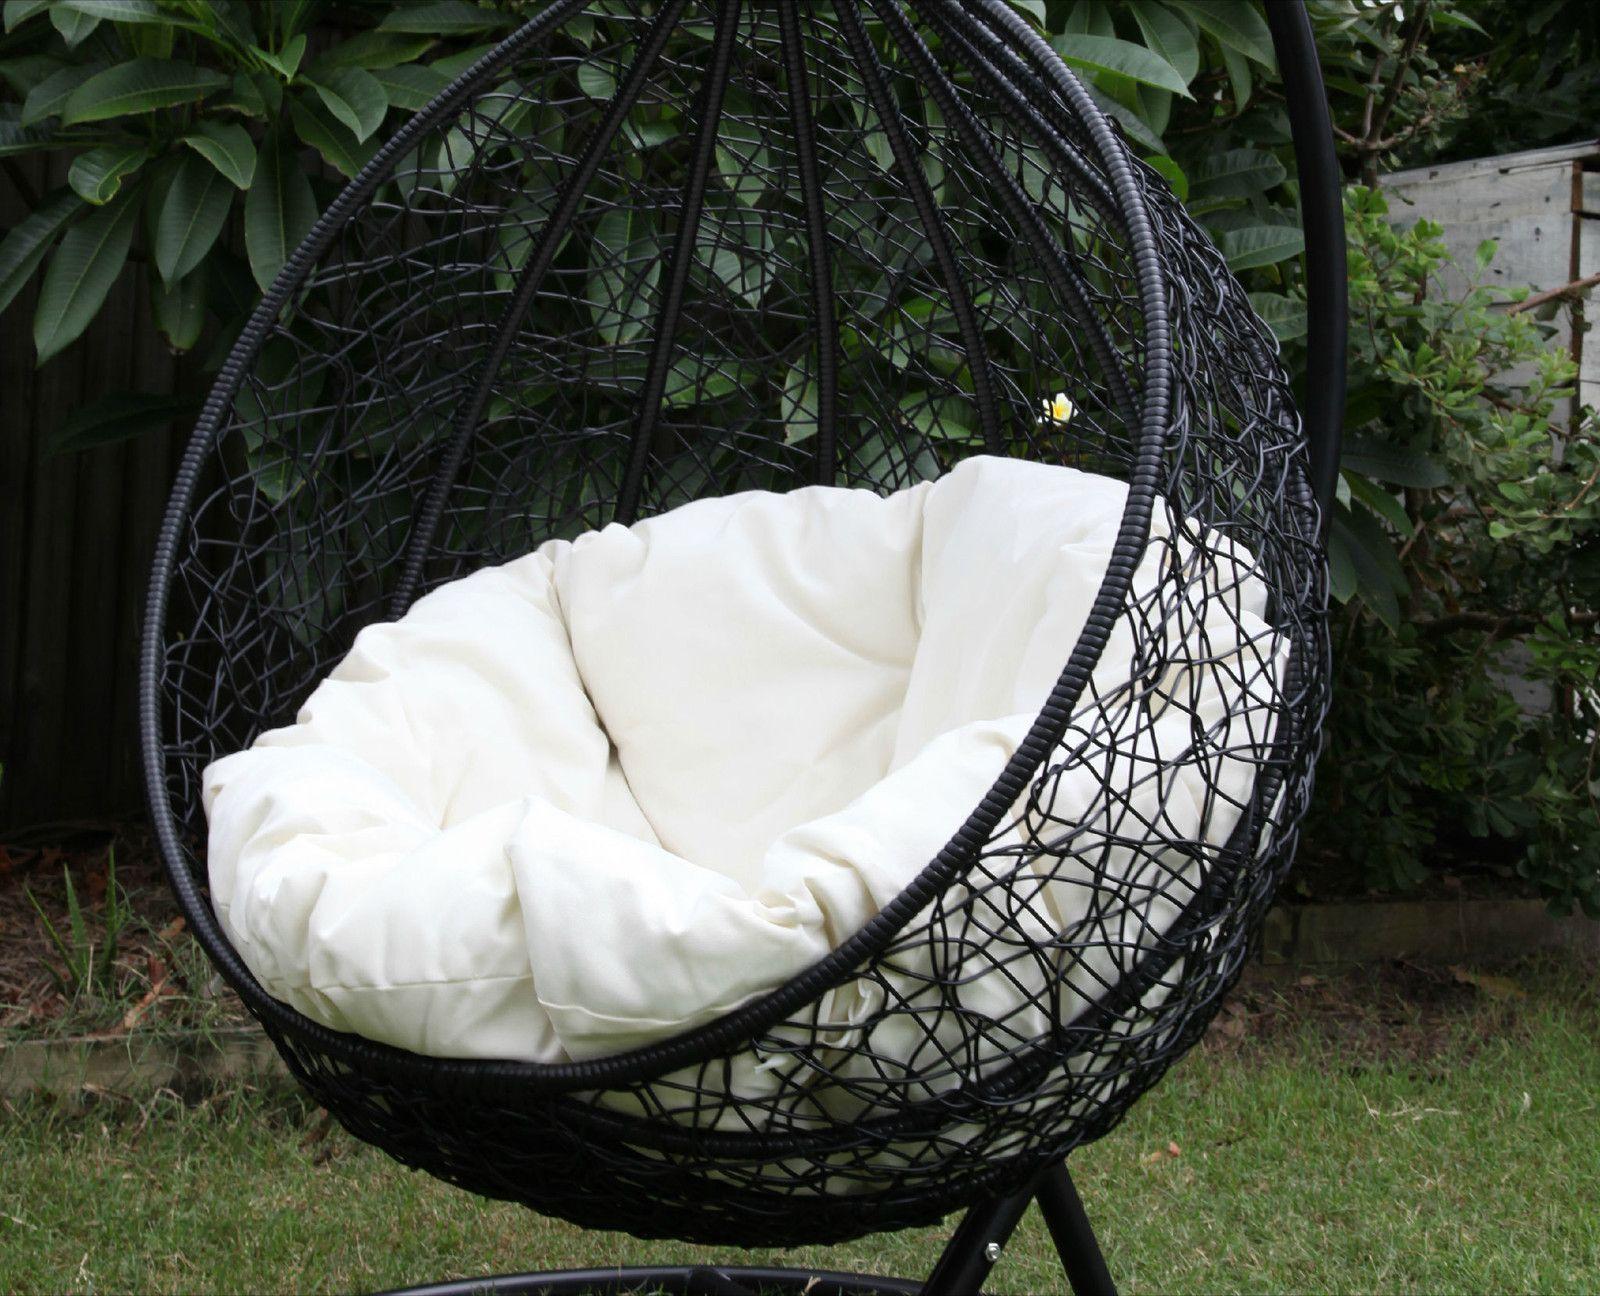 Skycarte Black Hanging Egg Chair with White Plush Cushion